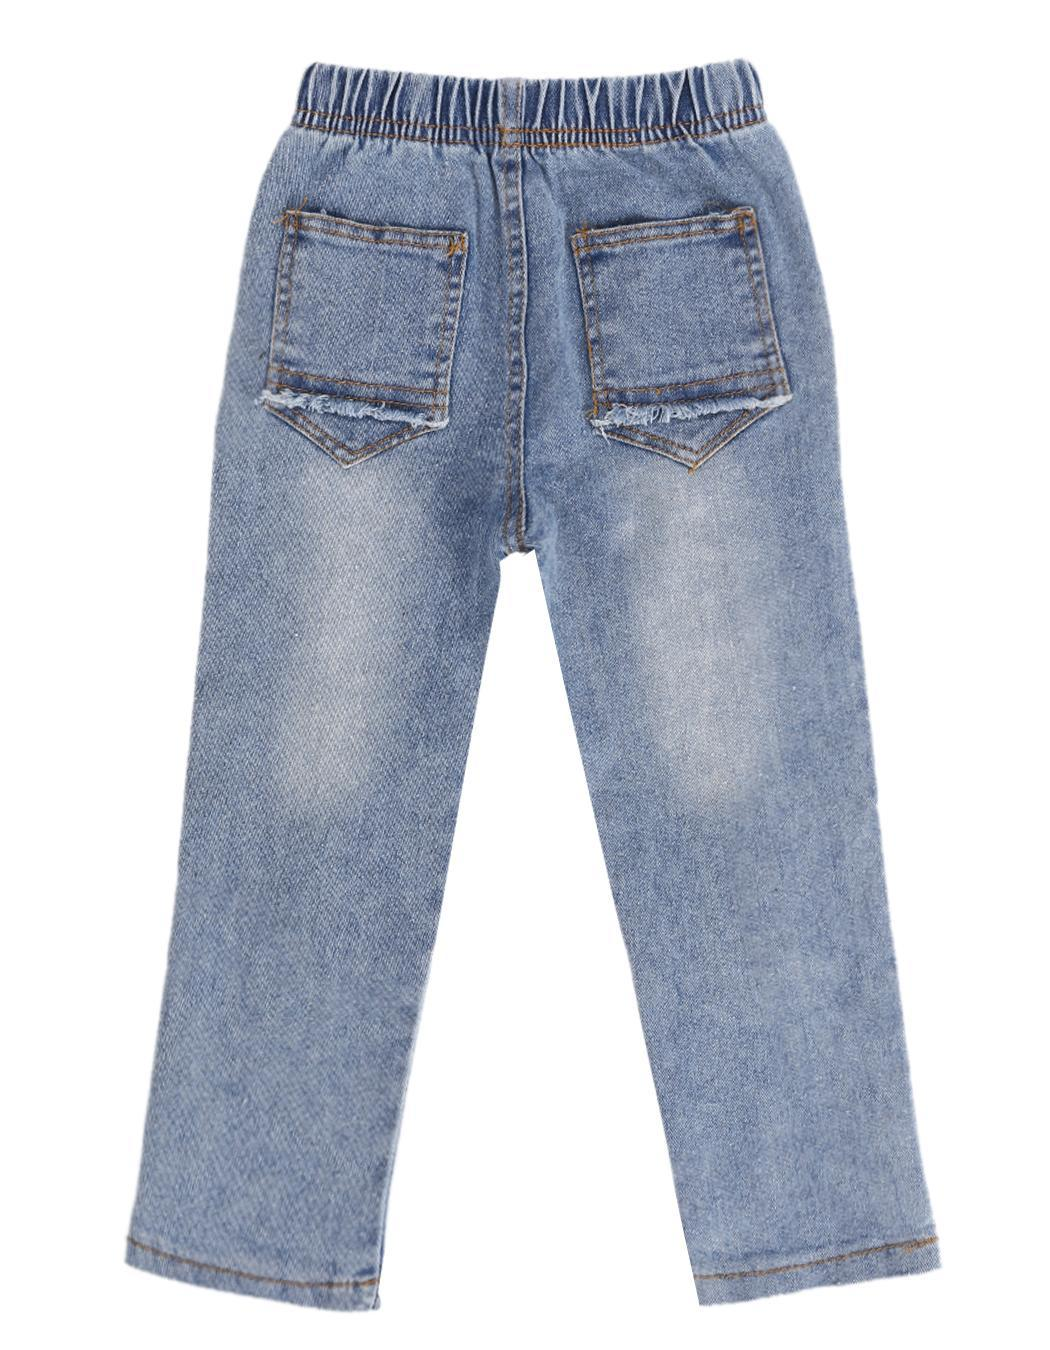 Cyber Kids Children Boys Elastic Waist Jeans Denim Pants ... - photo#23